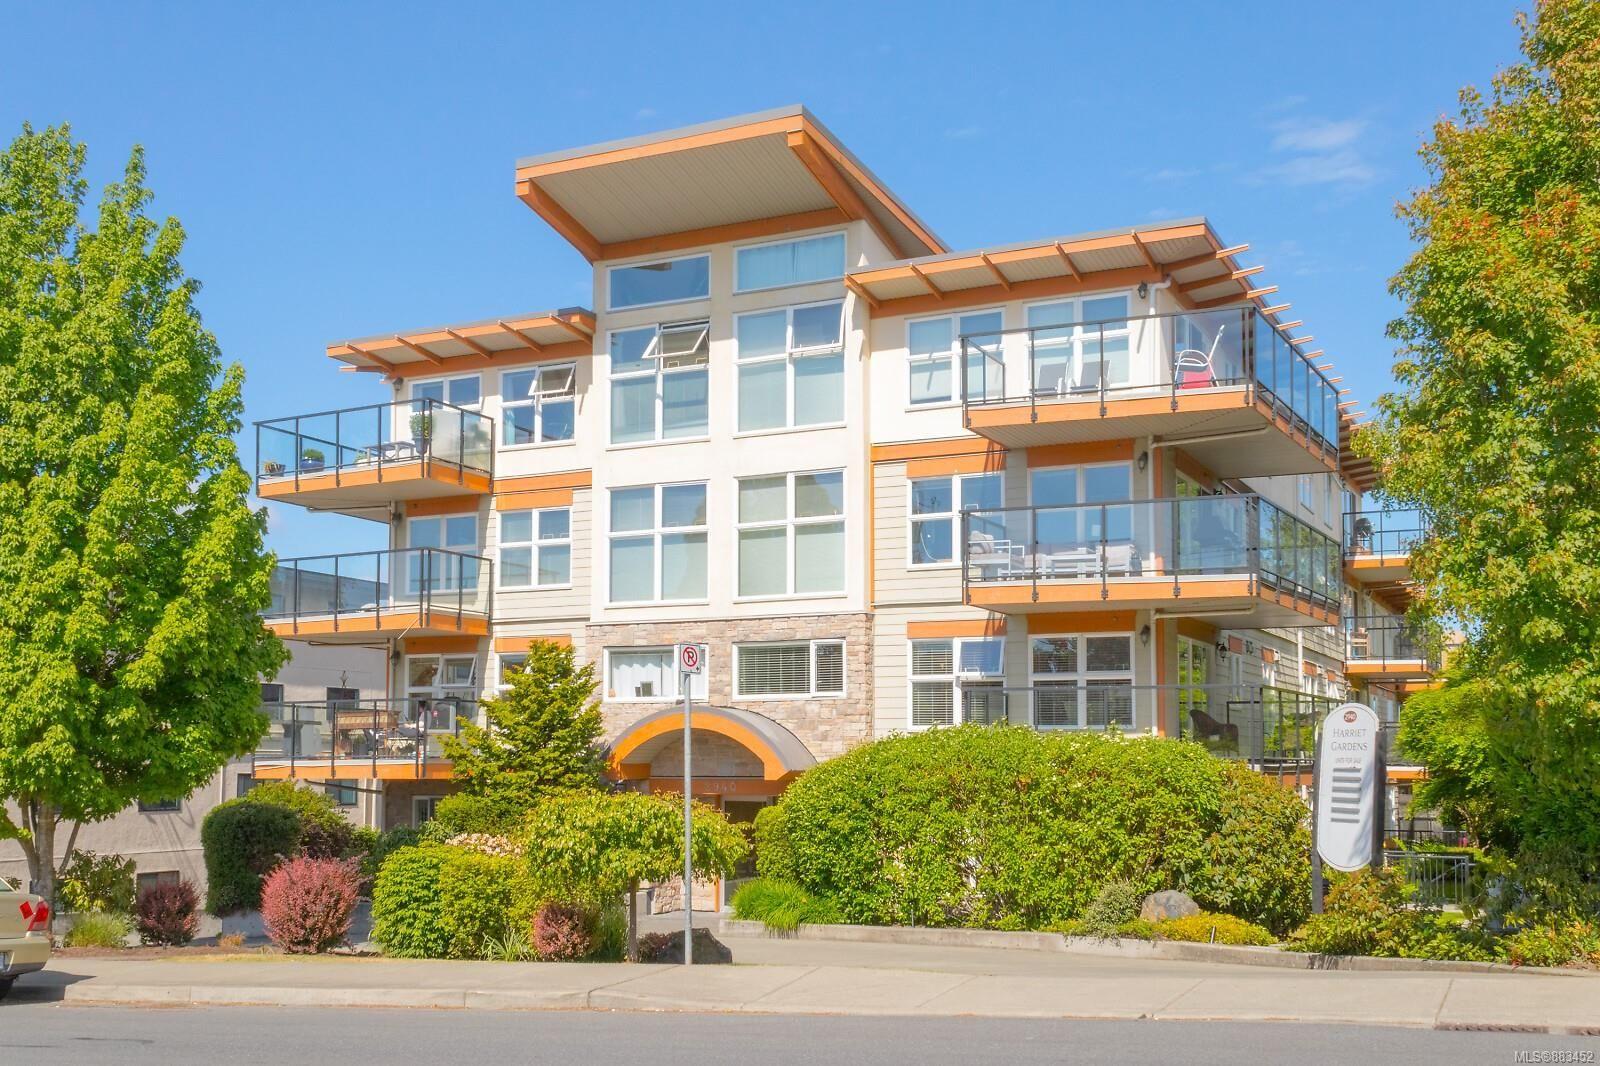 Main Photo: 203 2940 Harriet Rd in Saanich: SW Gorge Condo for sale (Saanich West)  : MLS®# 883452